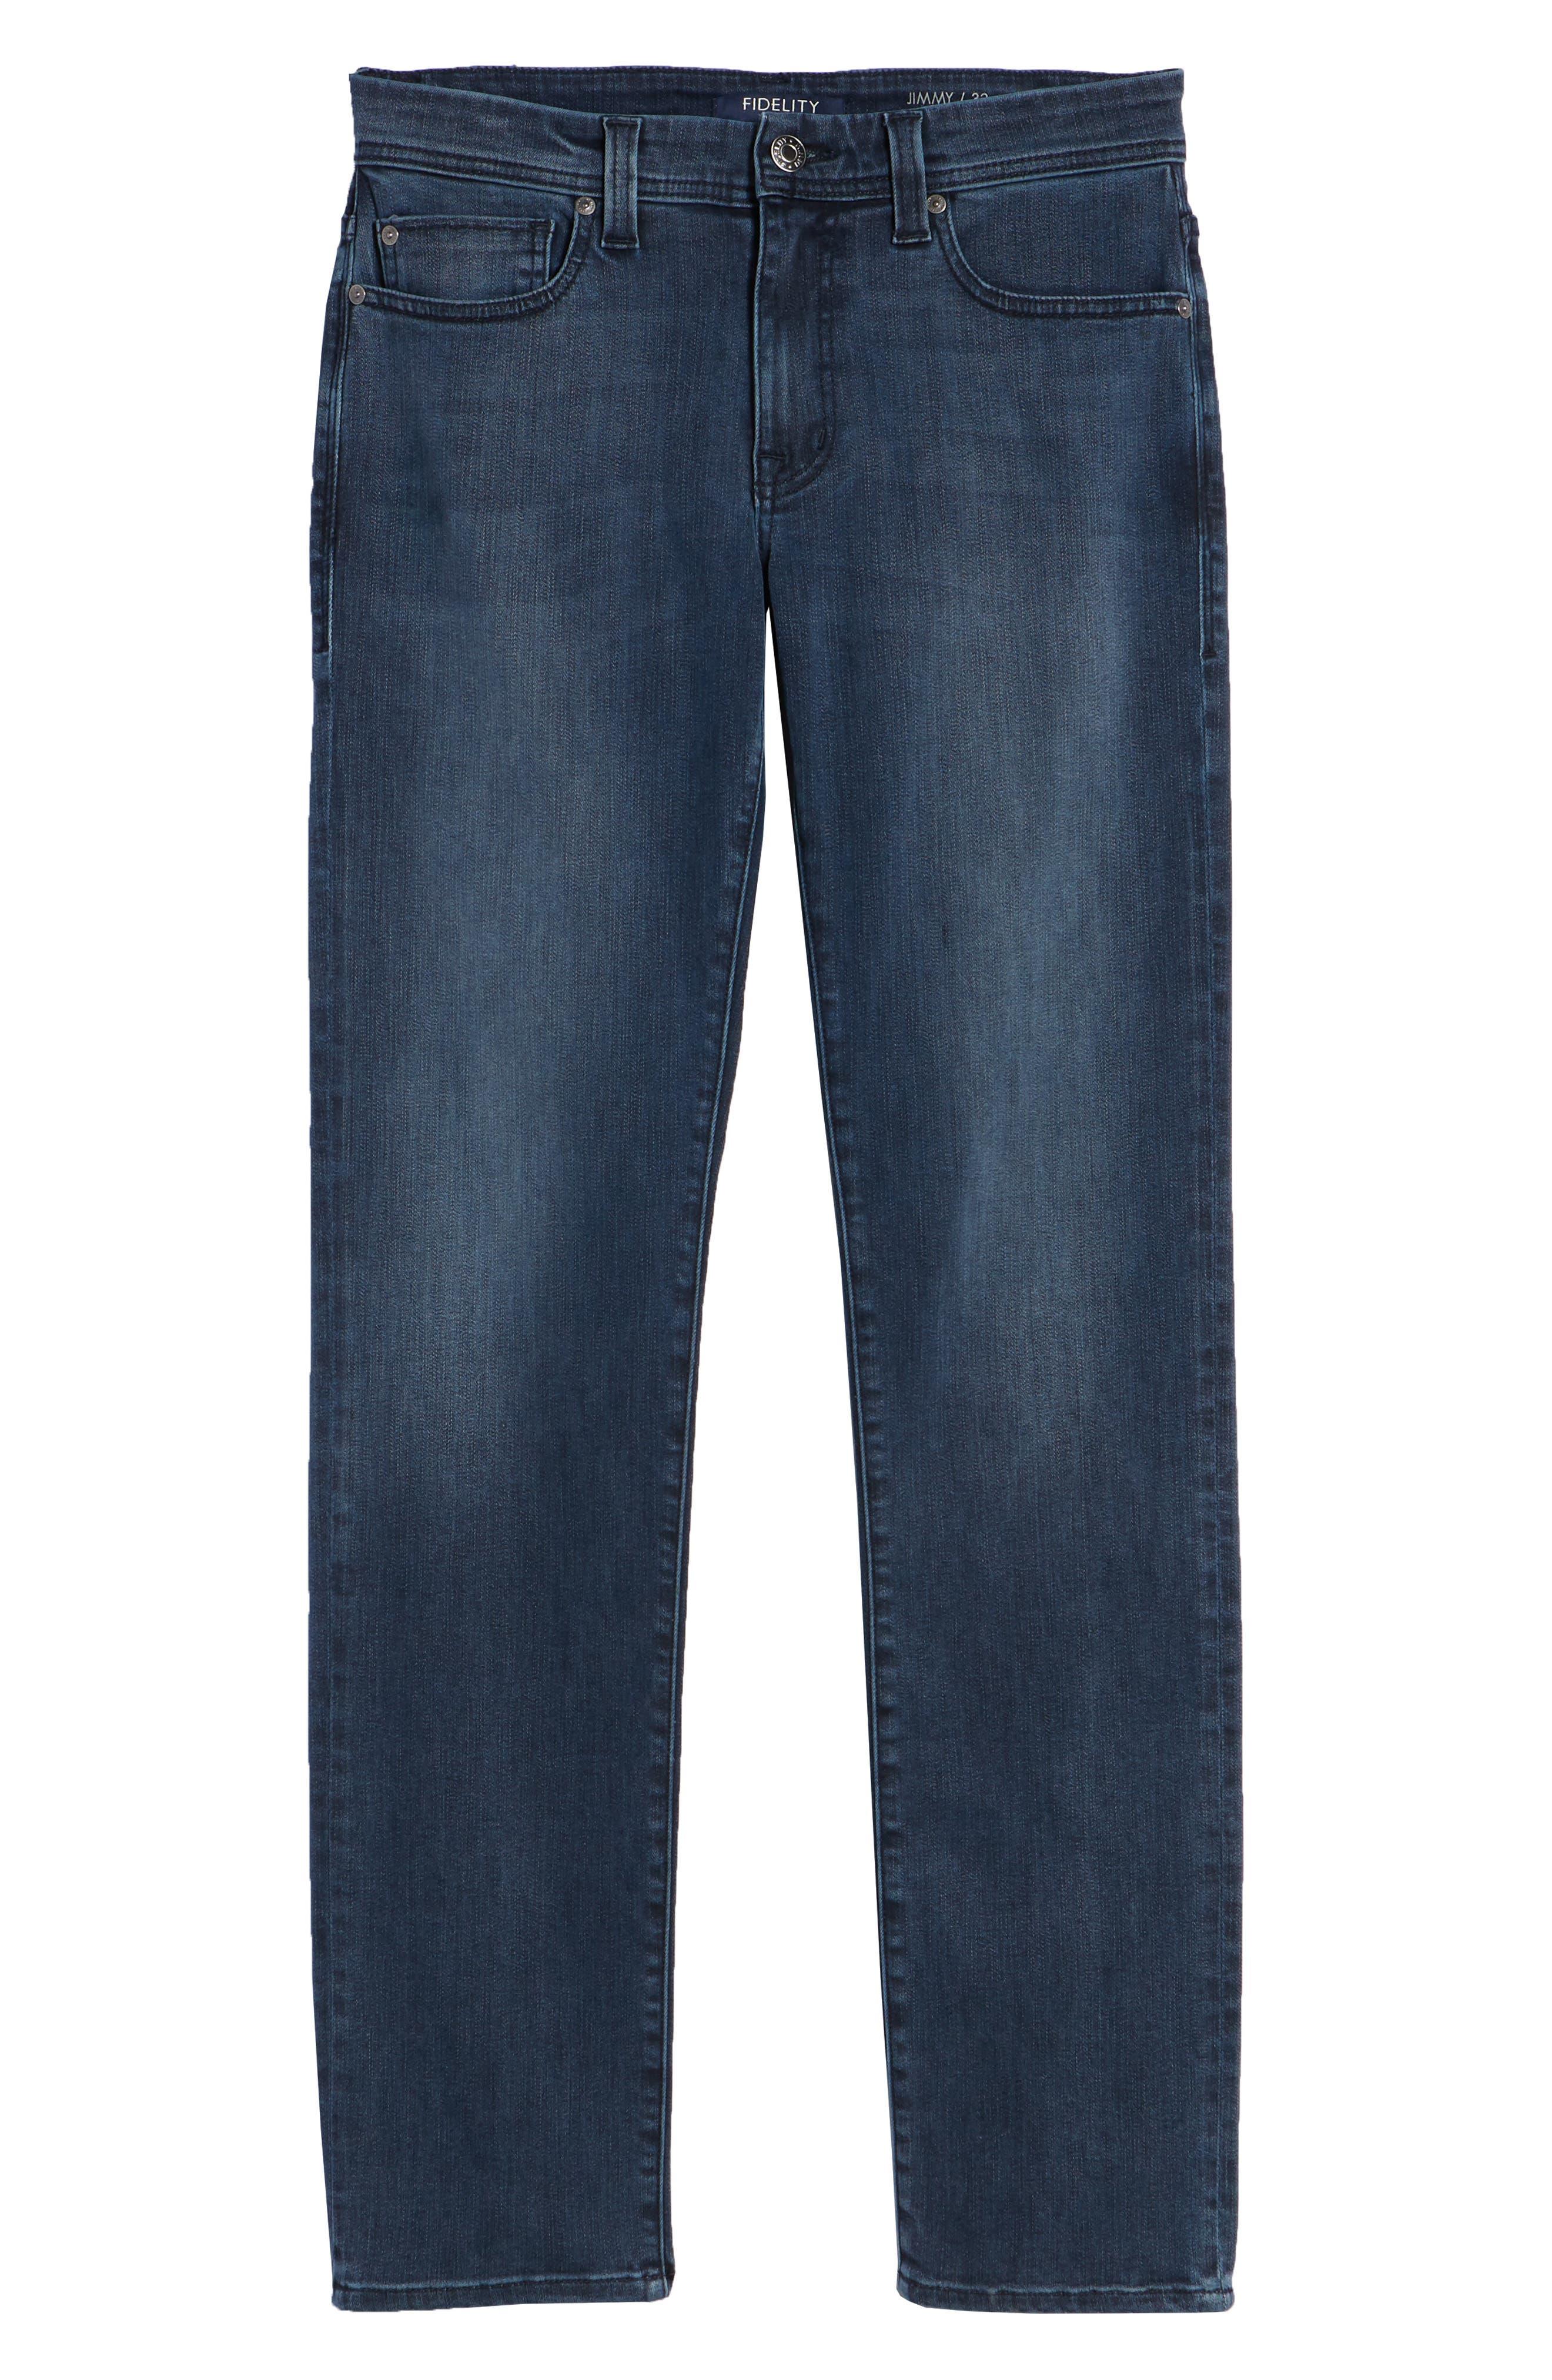 Jimmy Slim Straight Leg Jeans,                             Alternate thumbnail 6, color,                             Lexicon